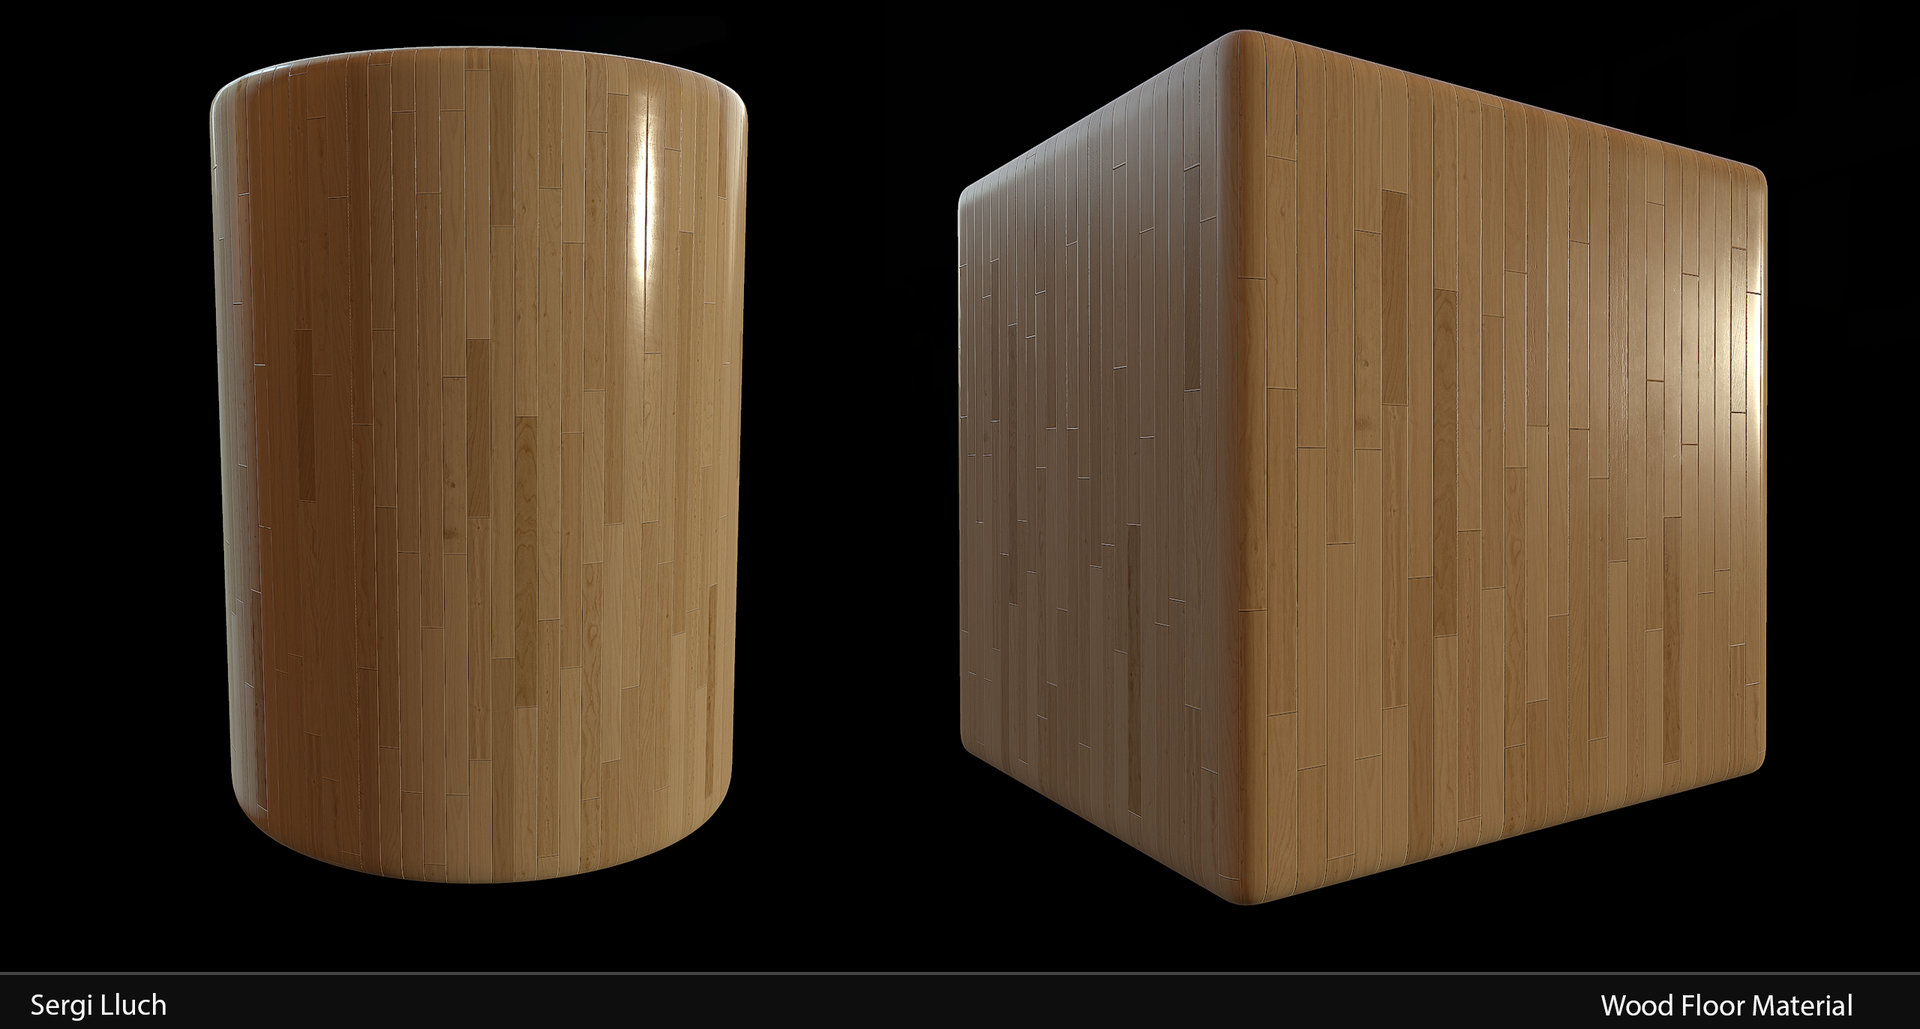 Sergi lluch wood floor material